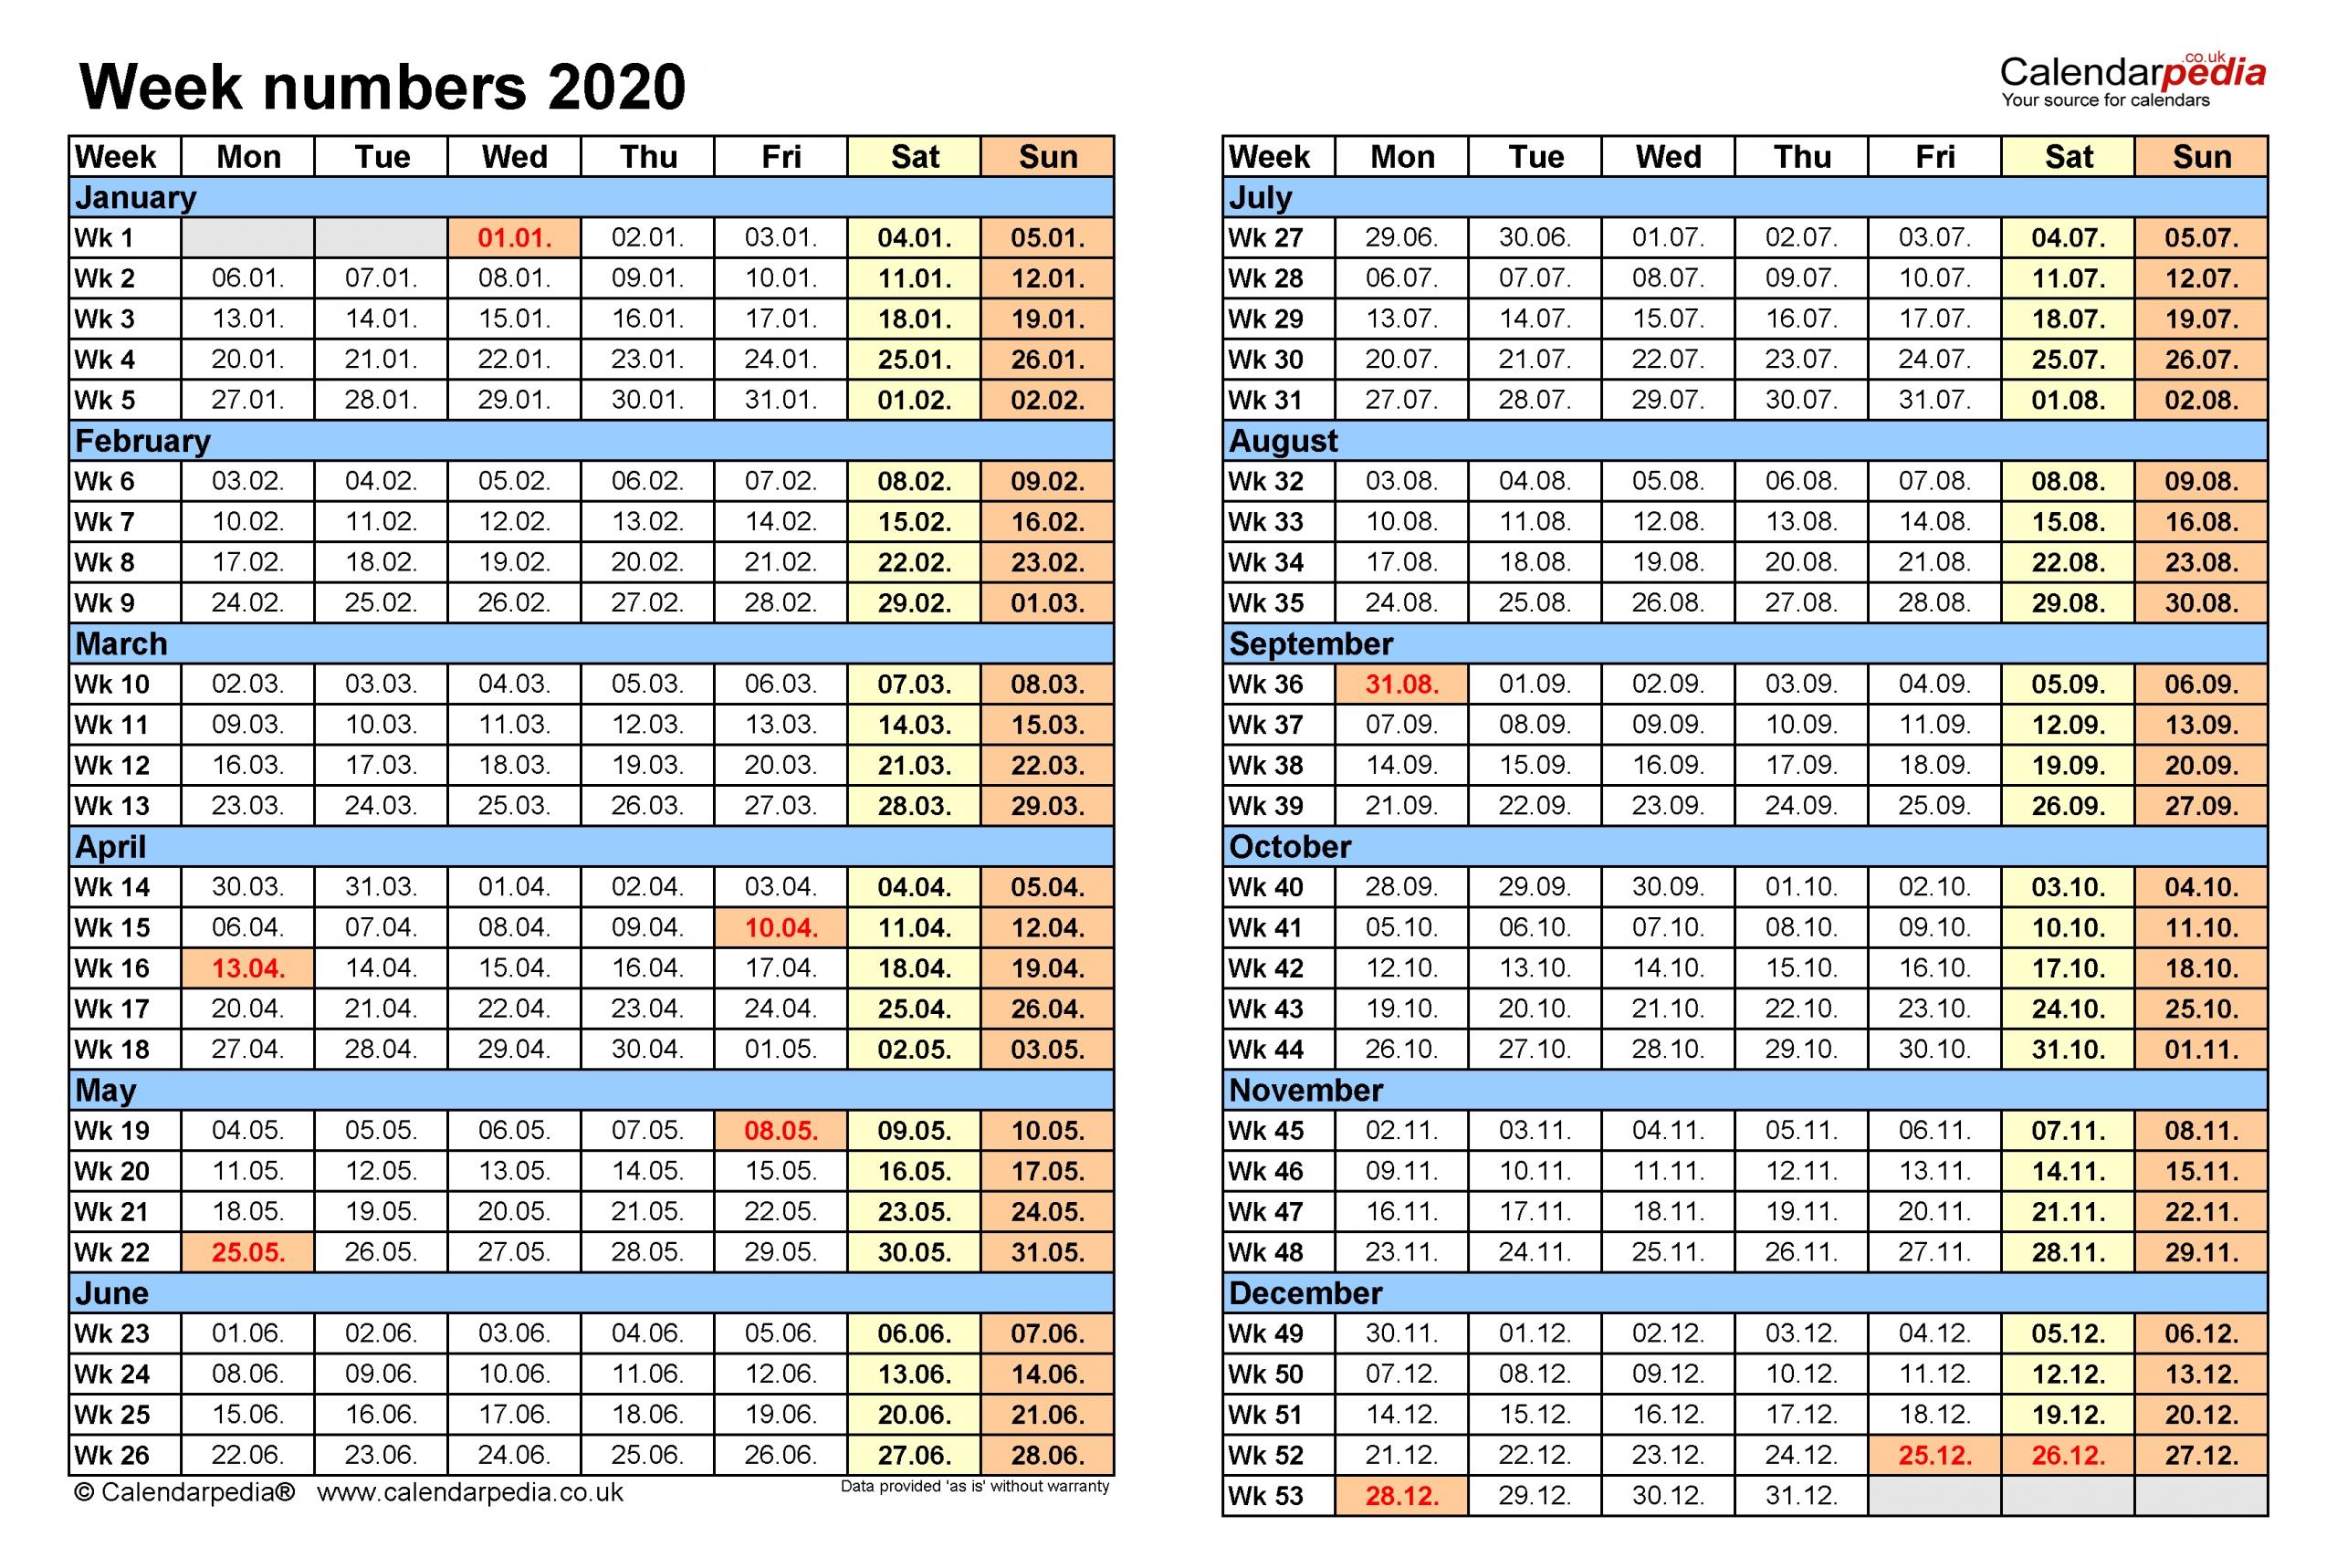 Week Numbers 2020 With Excel, Word And Pdf Templates-Yearly Week Number Calendar Excel0.